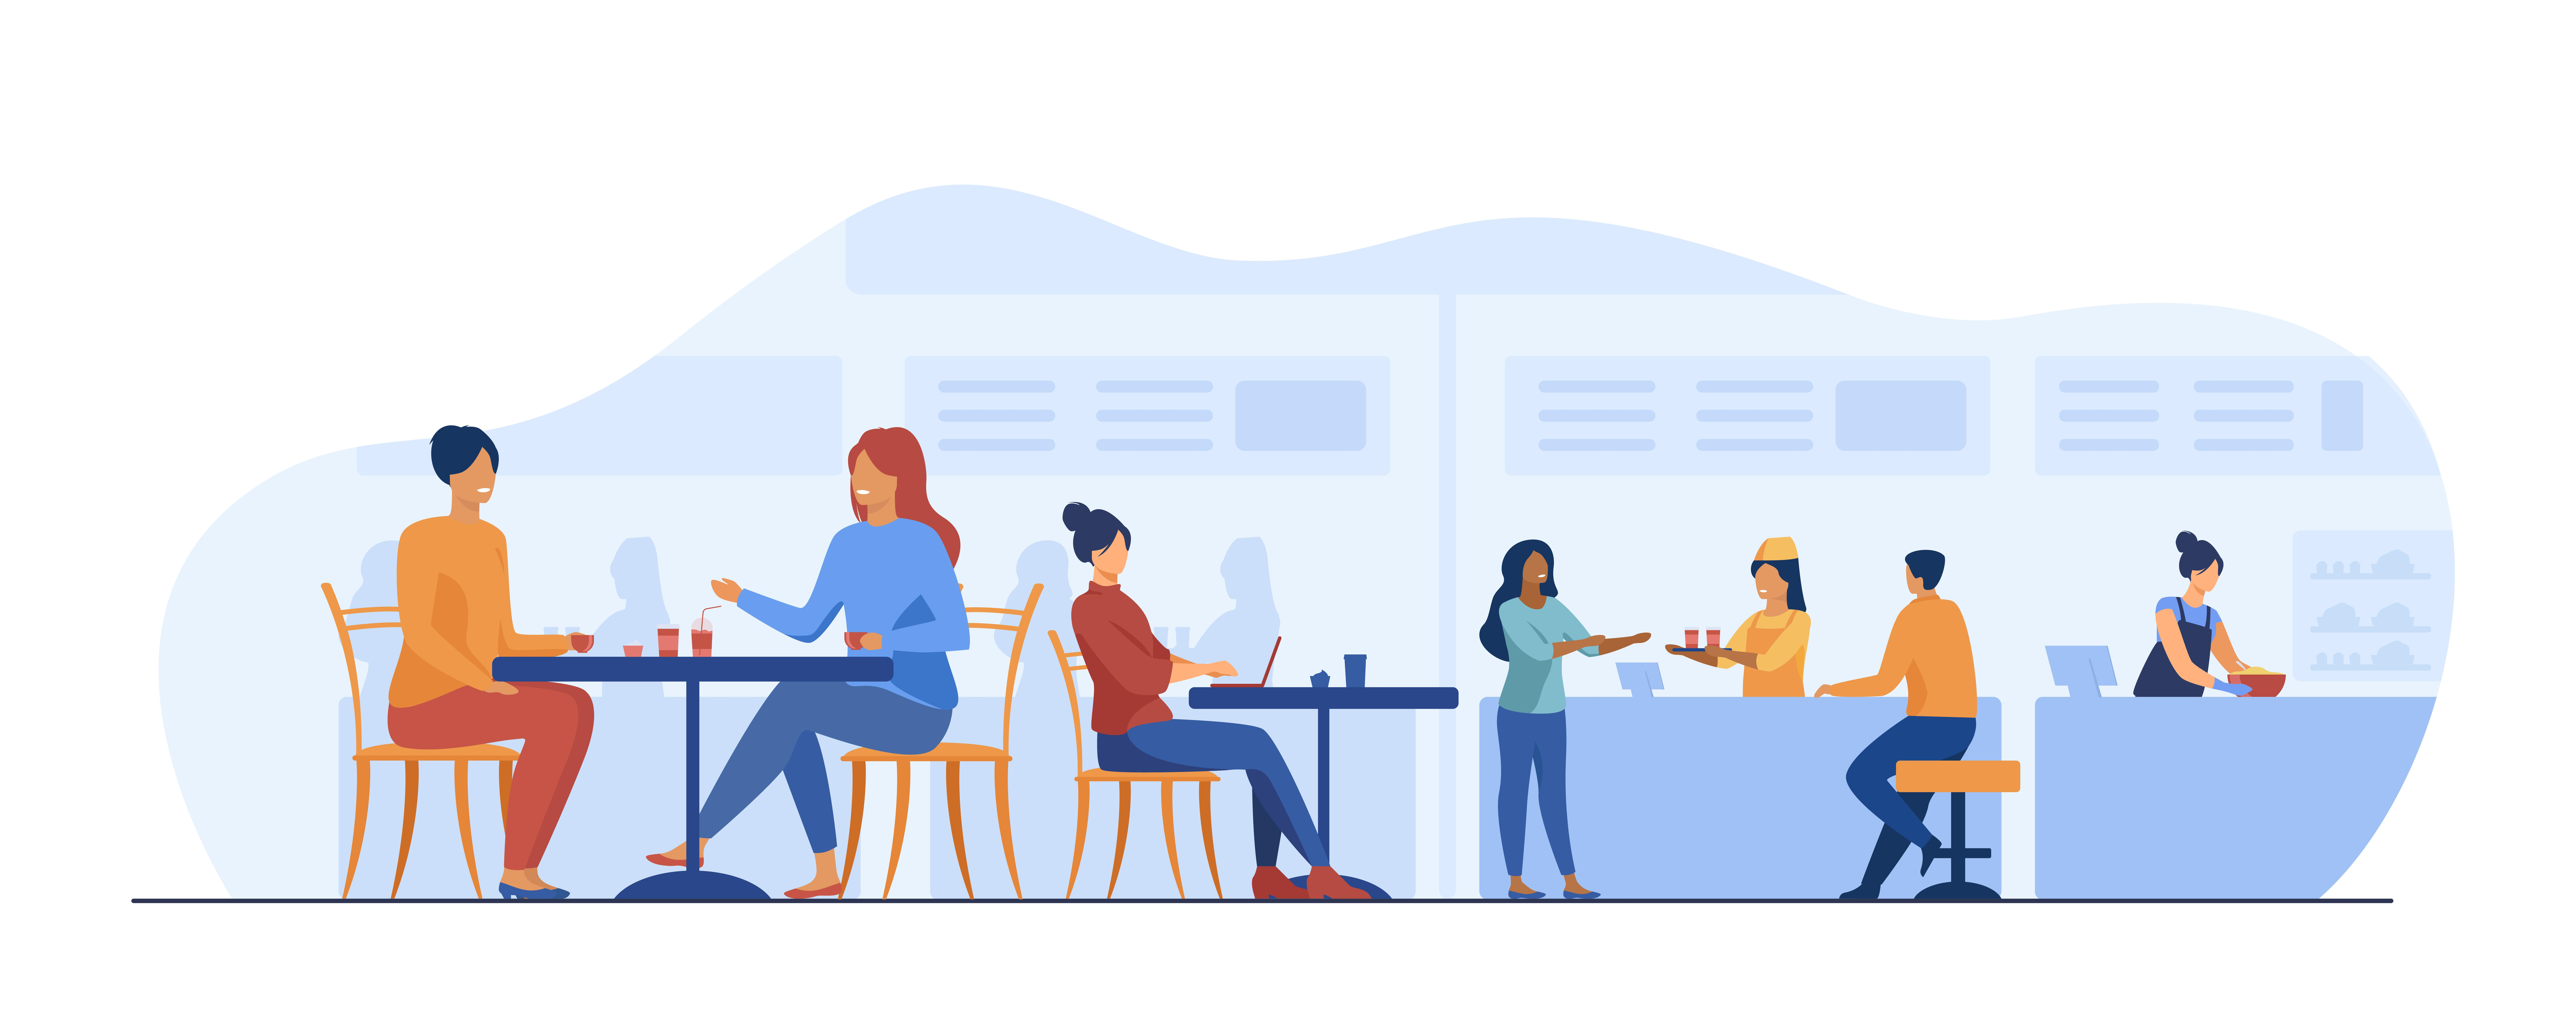 Improving employee engagement through food